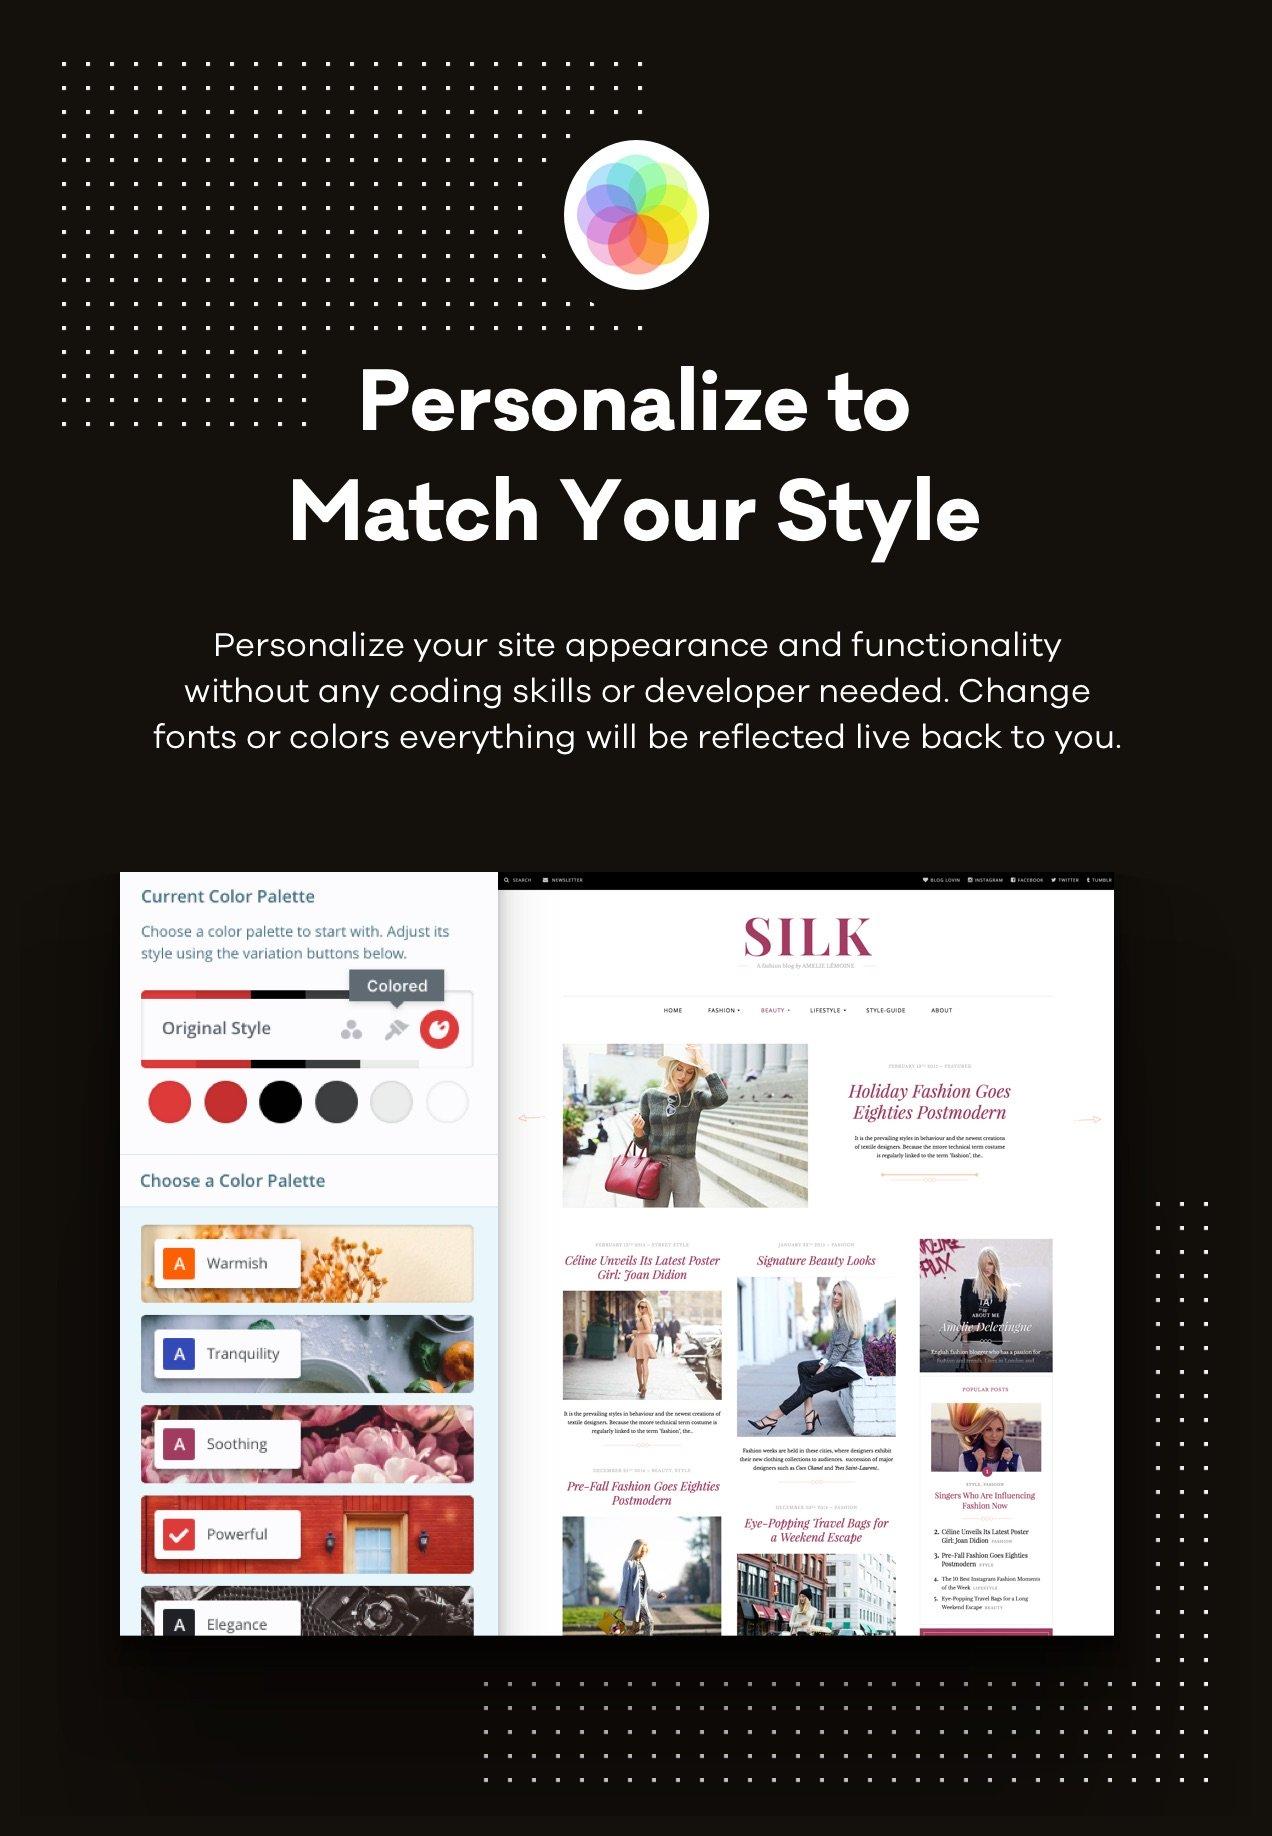 silk-personalize-N9yAC.jpg